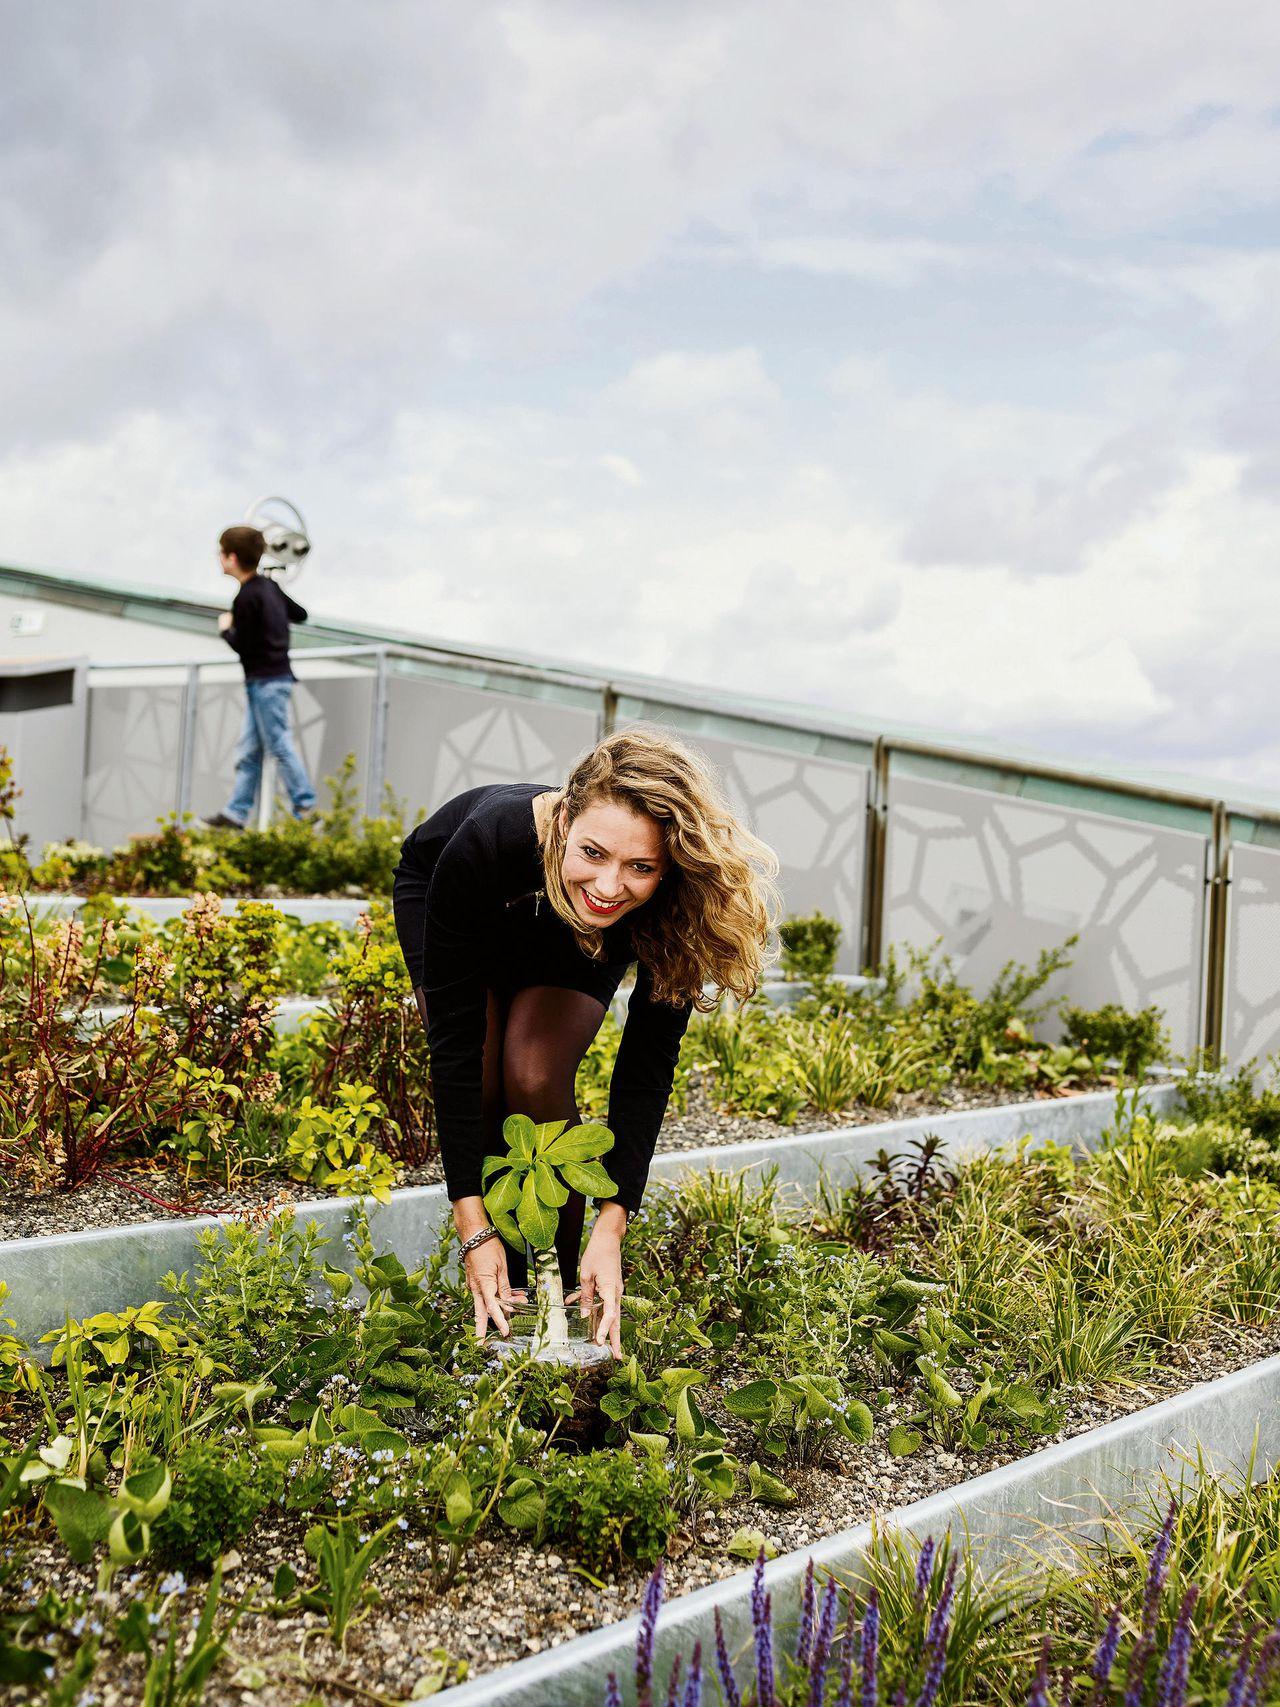 Nederland is wereldleider in bloemen, maar innoveren? ho maar!   nrc